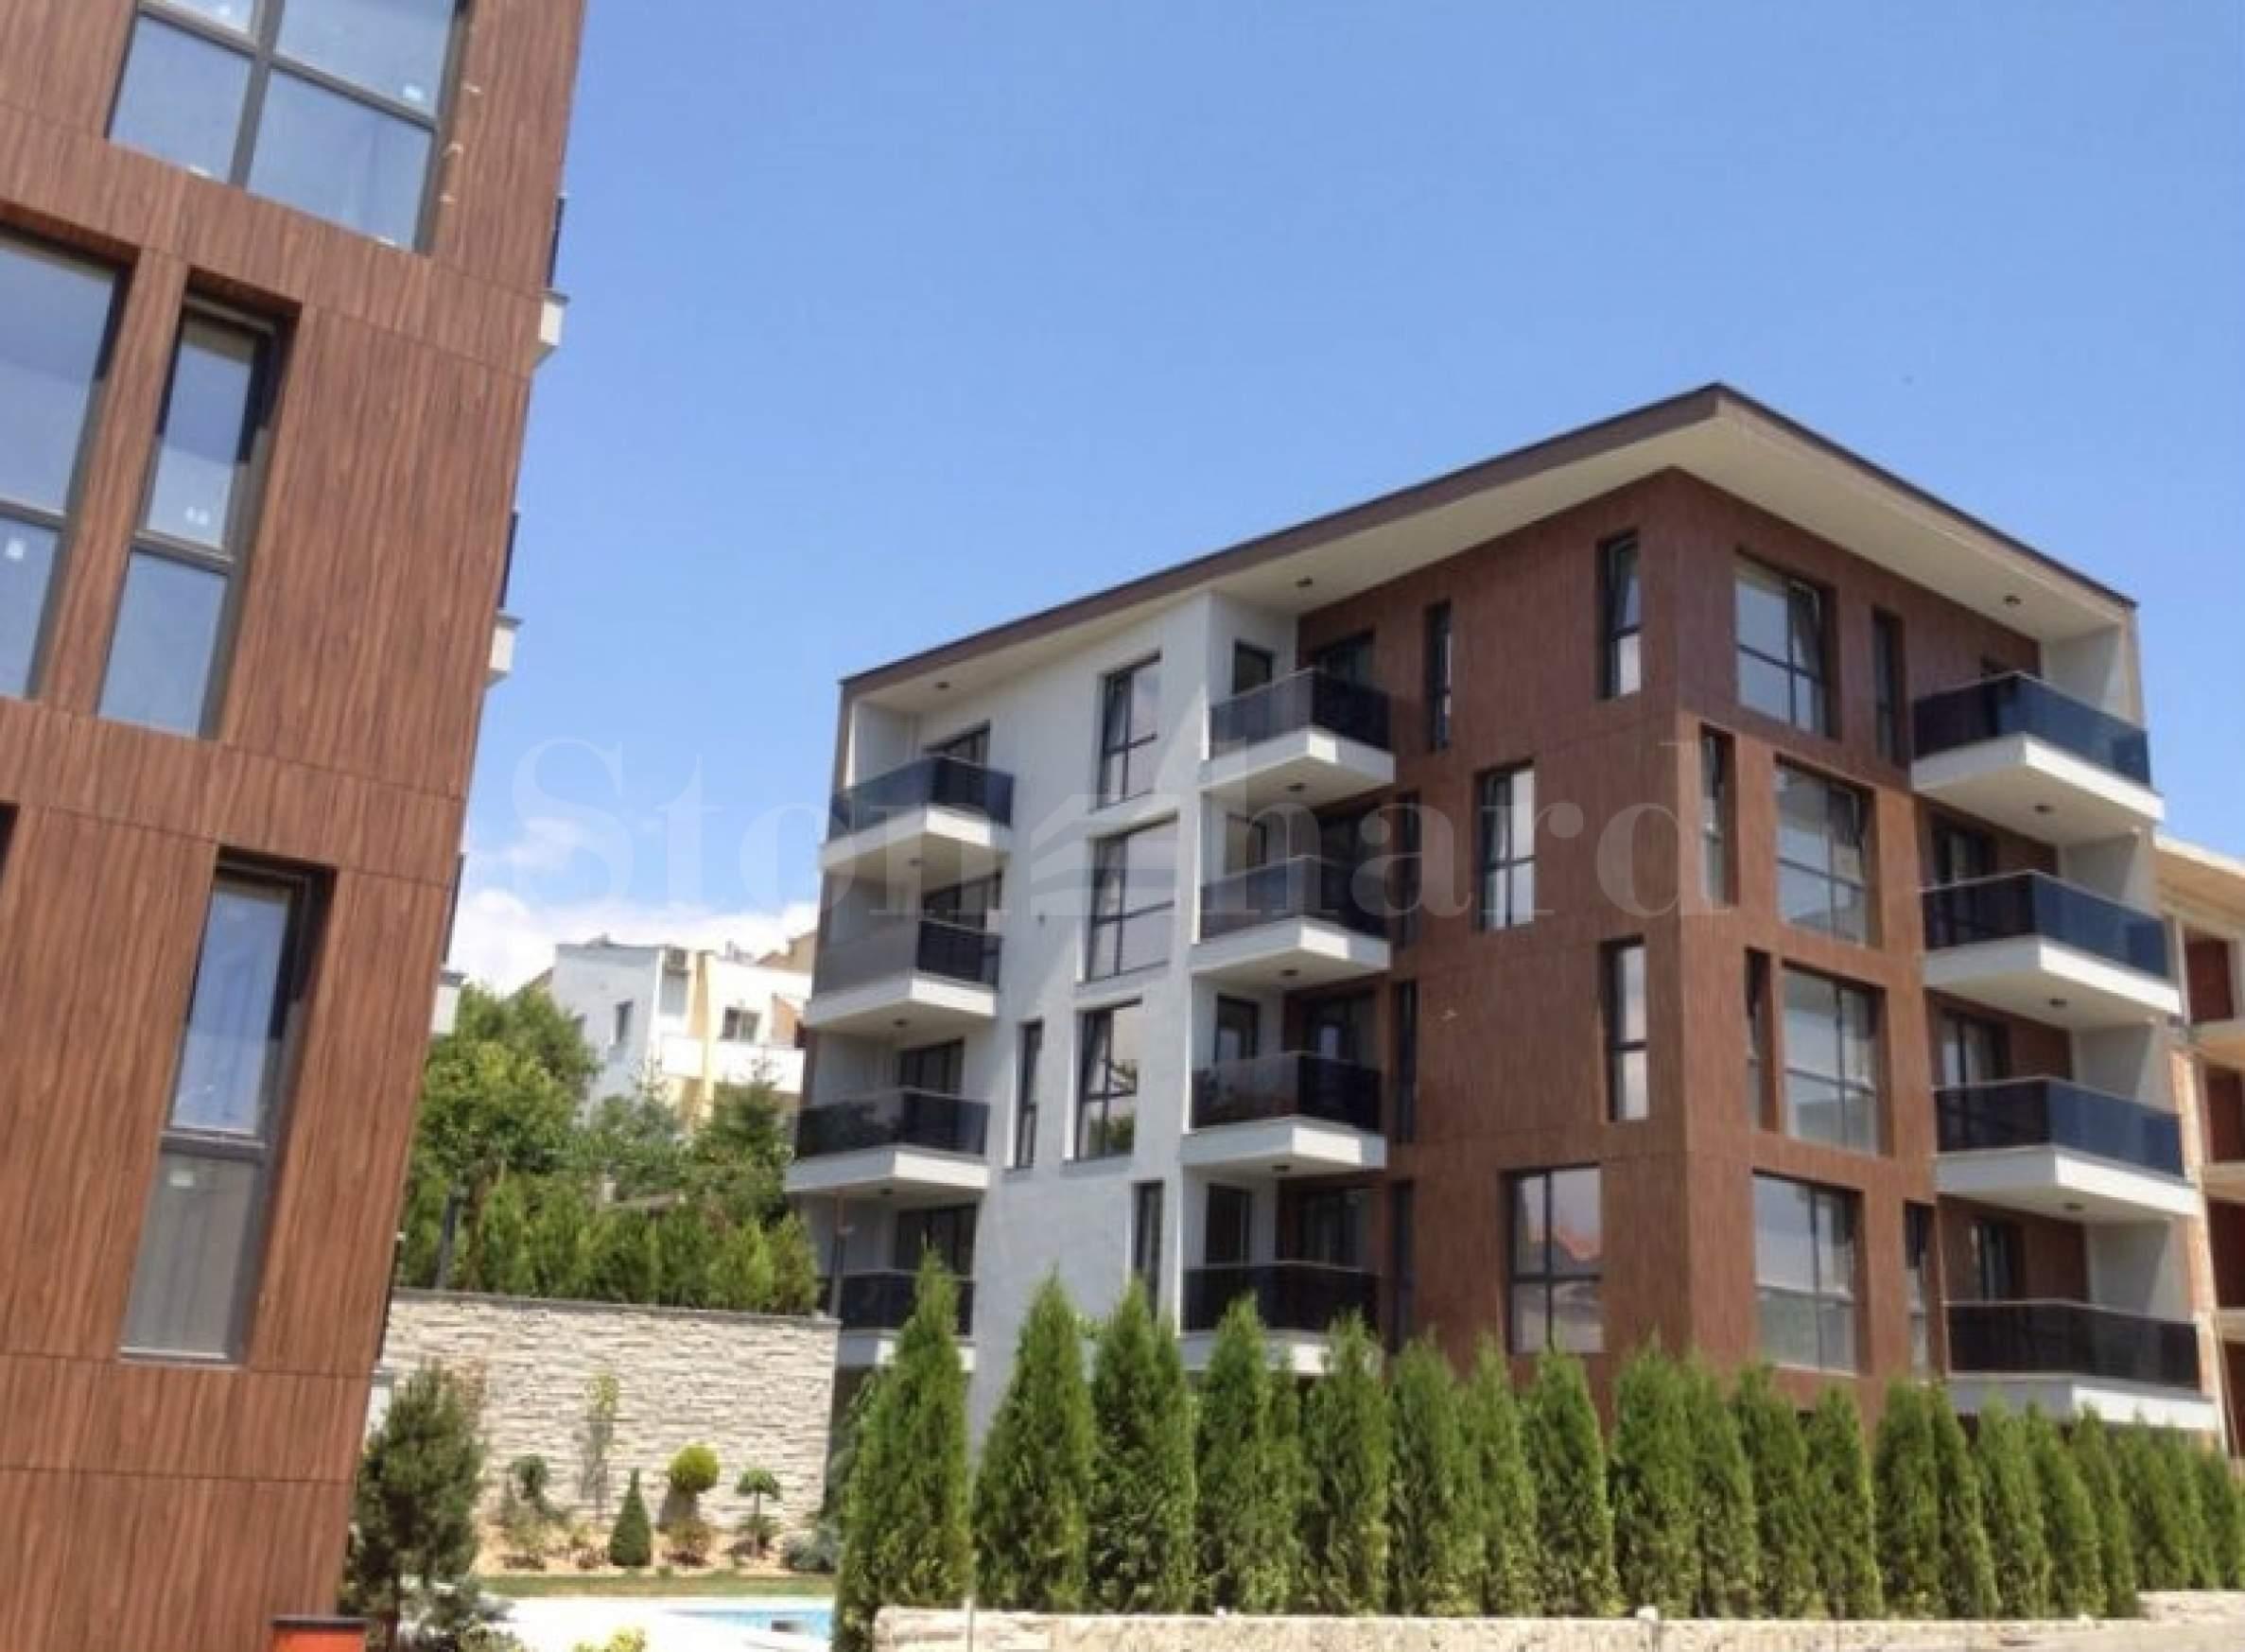 Turn-key apartments in prestigious Euxinograde1 - Stonehard